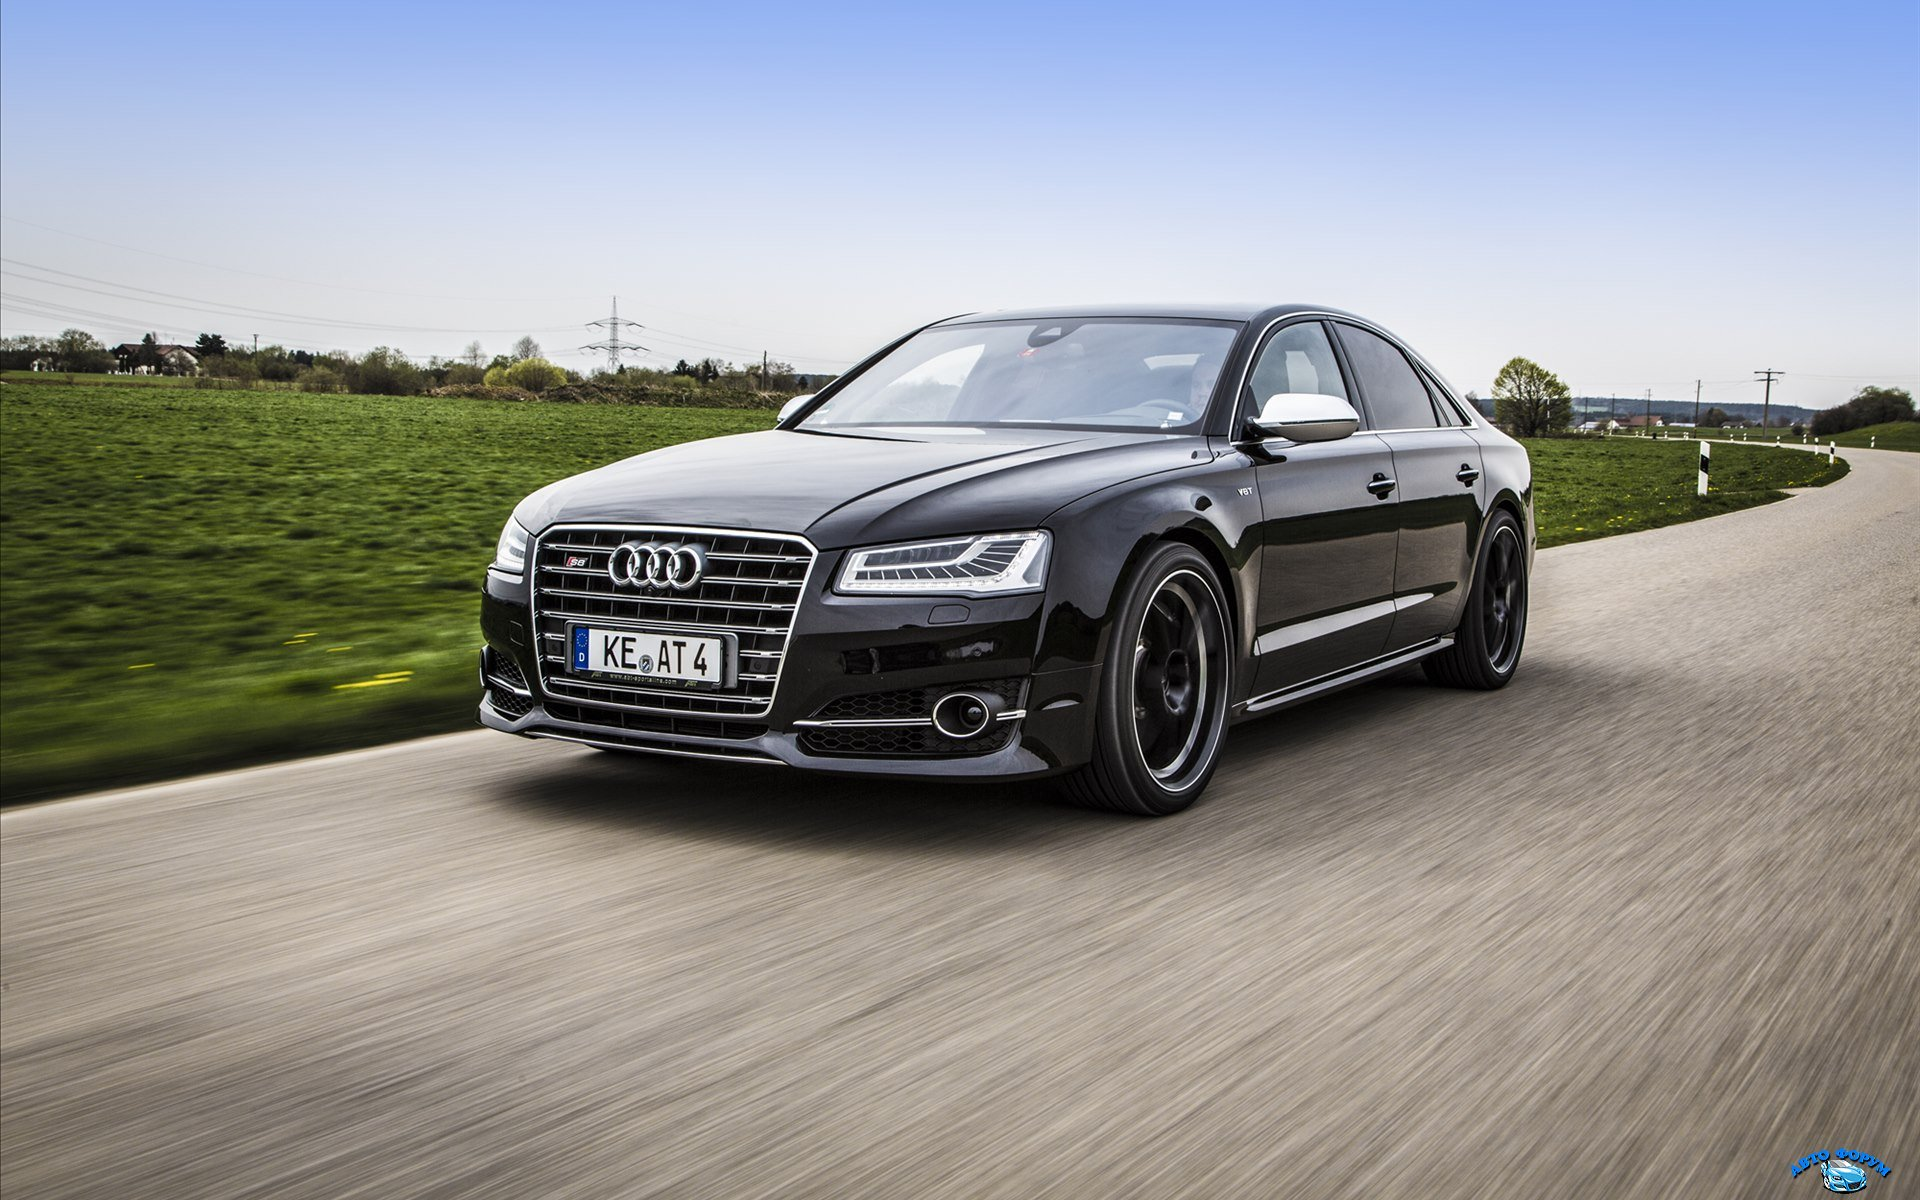 ABT-Sportsline-Audi-S8-2014-widescreen-01.jpg